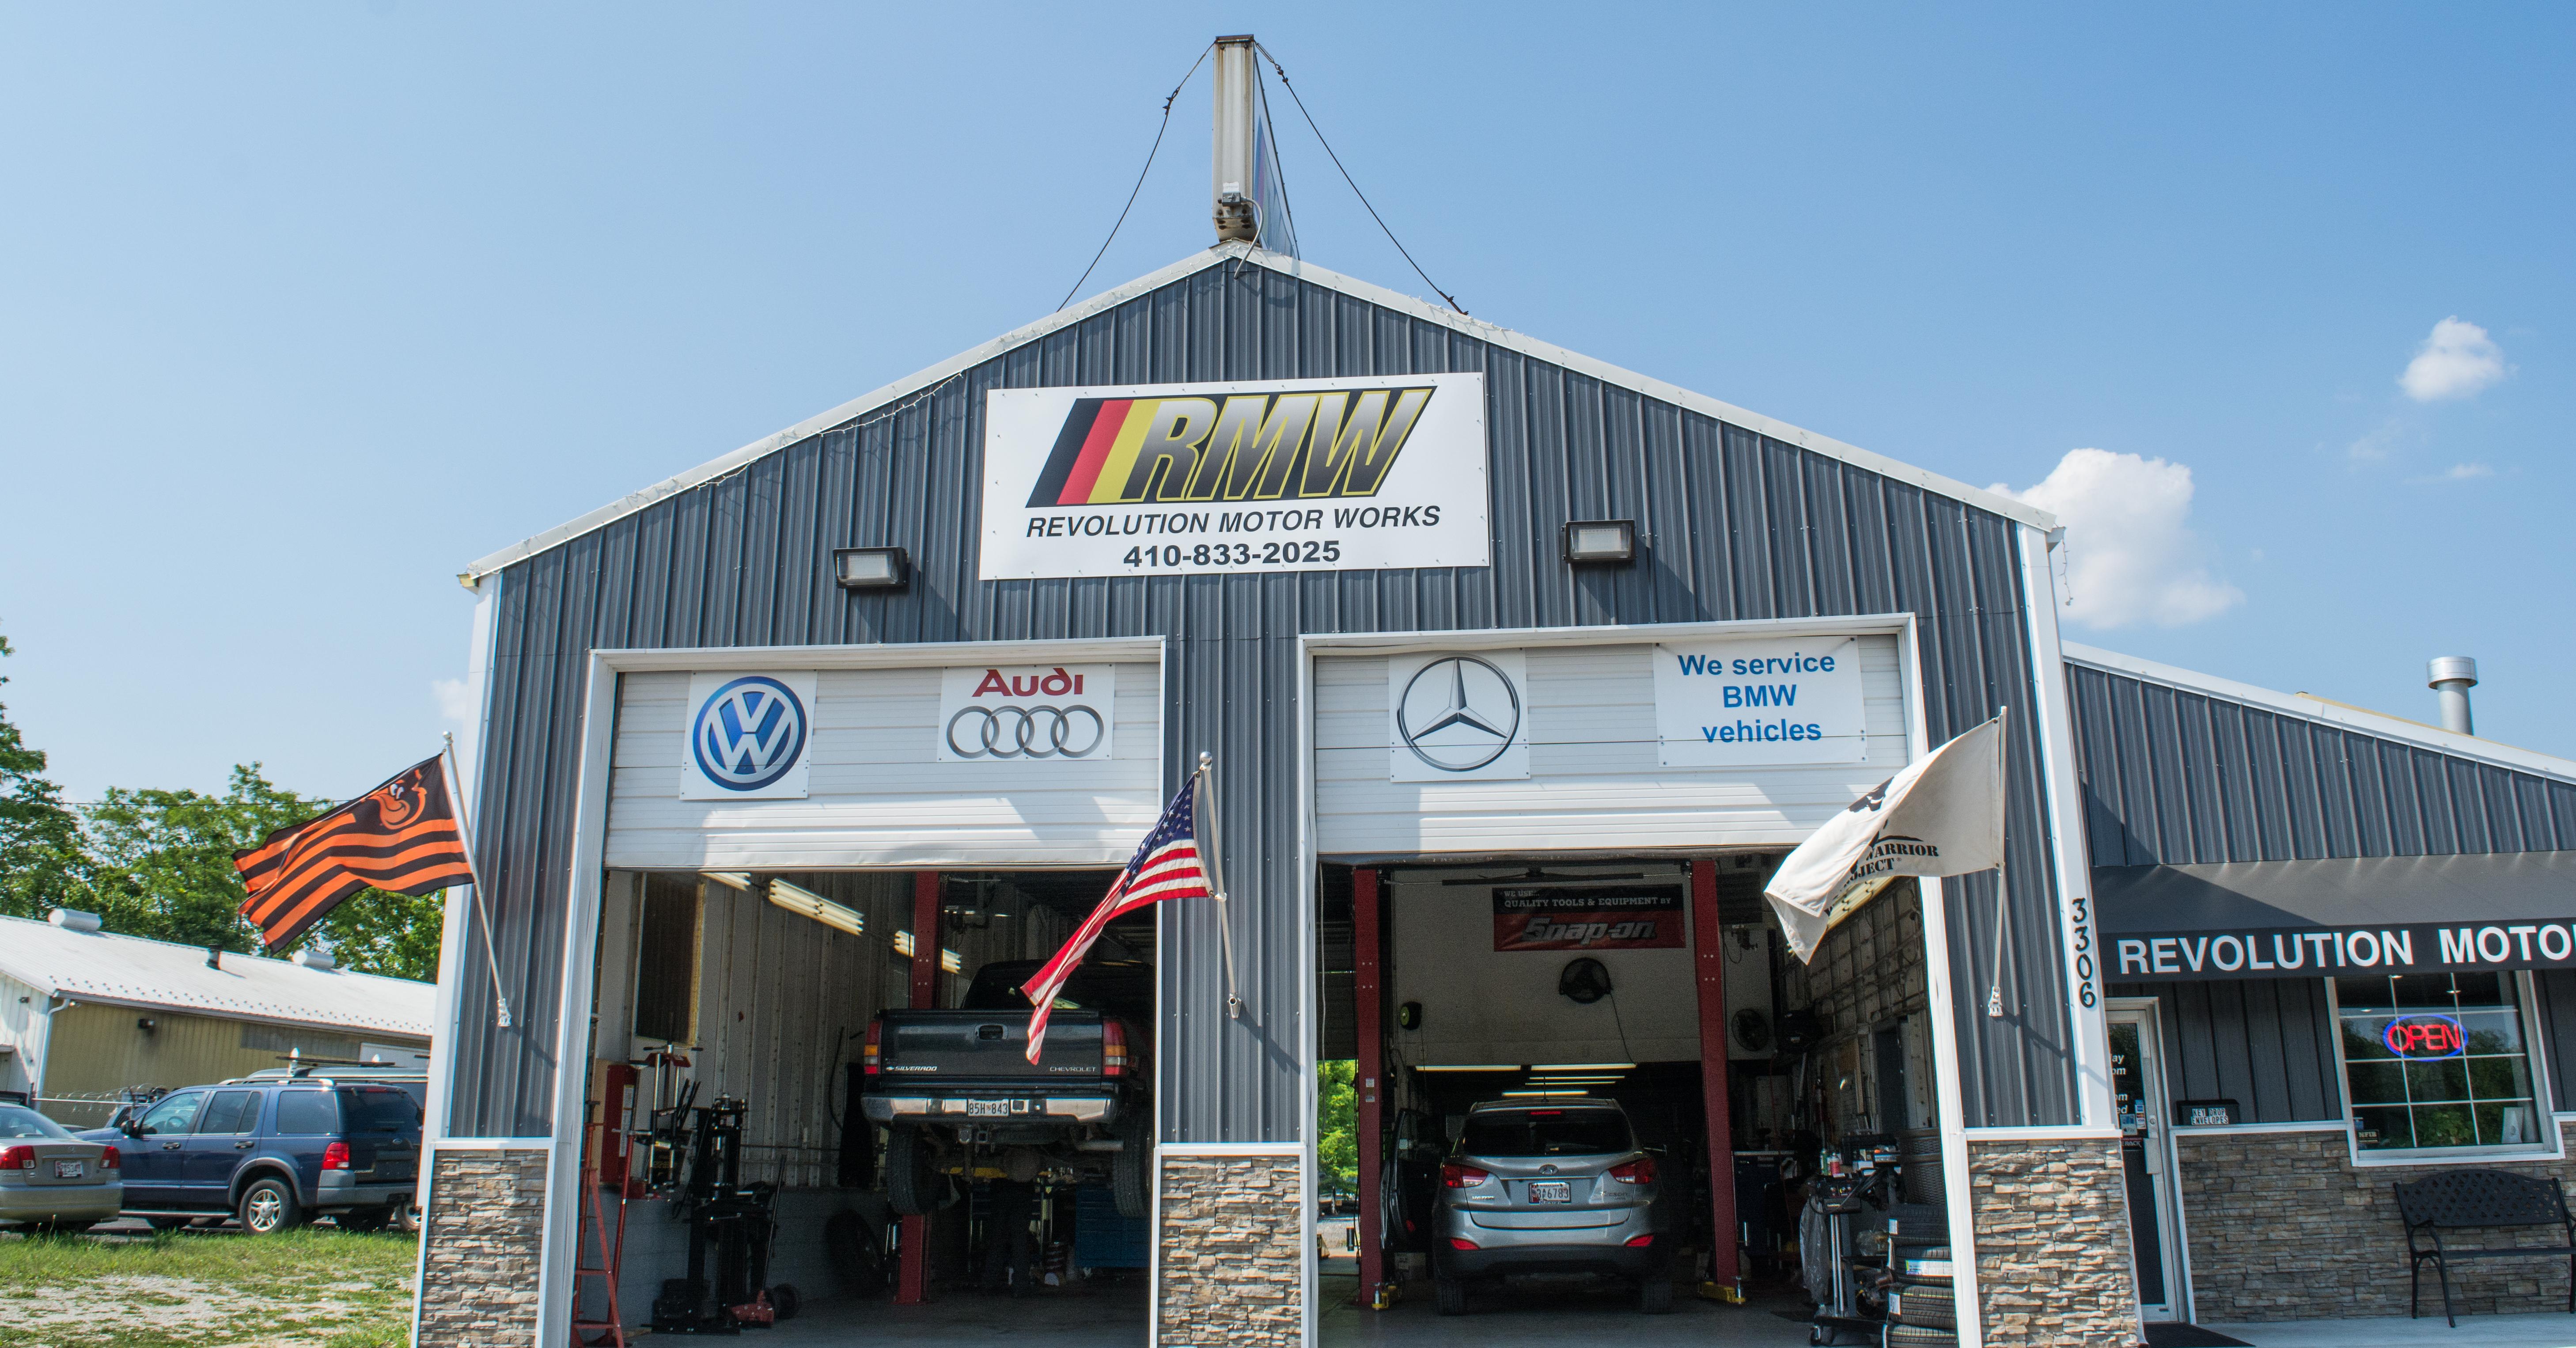 Revolution Motor Works | Auto Repair in 3306 Baltimore Blvd - Finksburg MD - Reviews - Photos - Phone Number